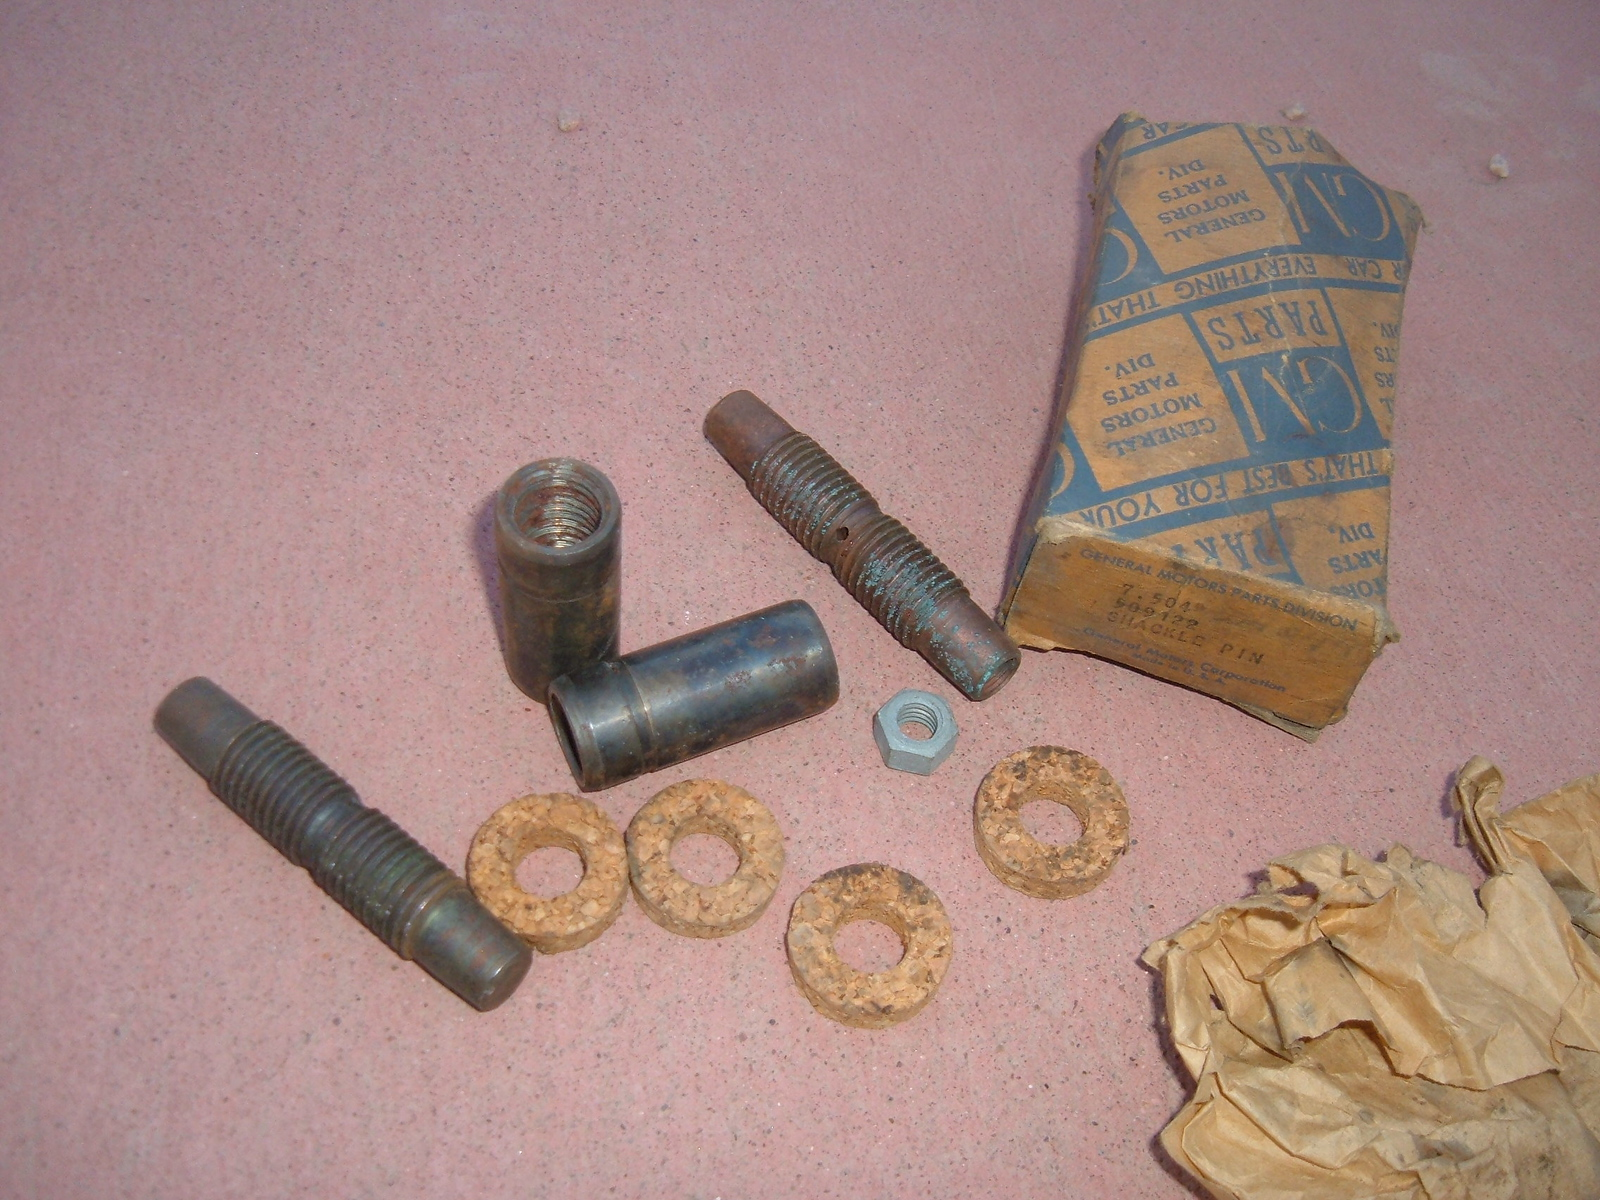 1937 38 39 40 41 42 46 47 48b 49 pontiac spring shackle pin kit nos 509422 (z 509422)